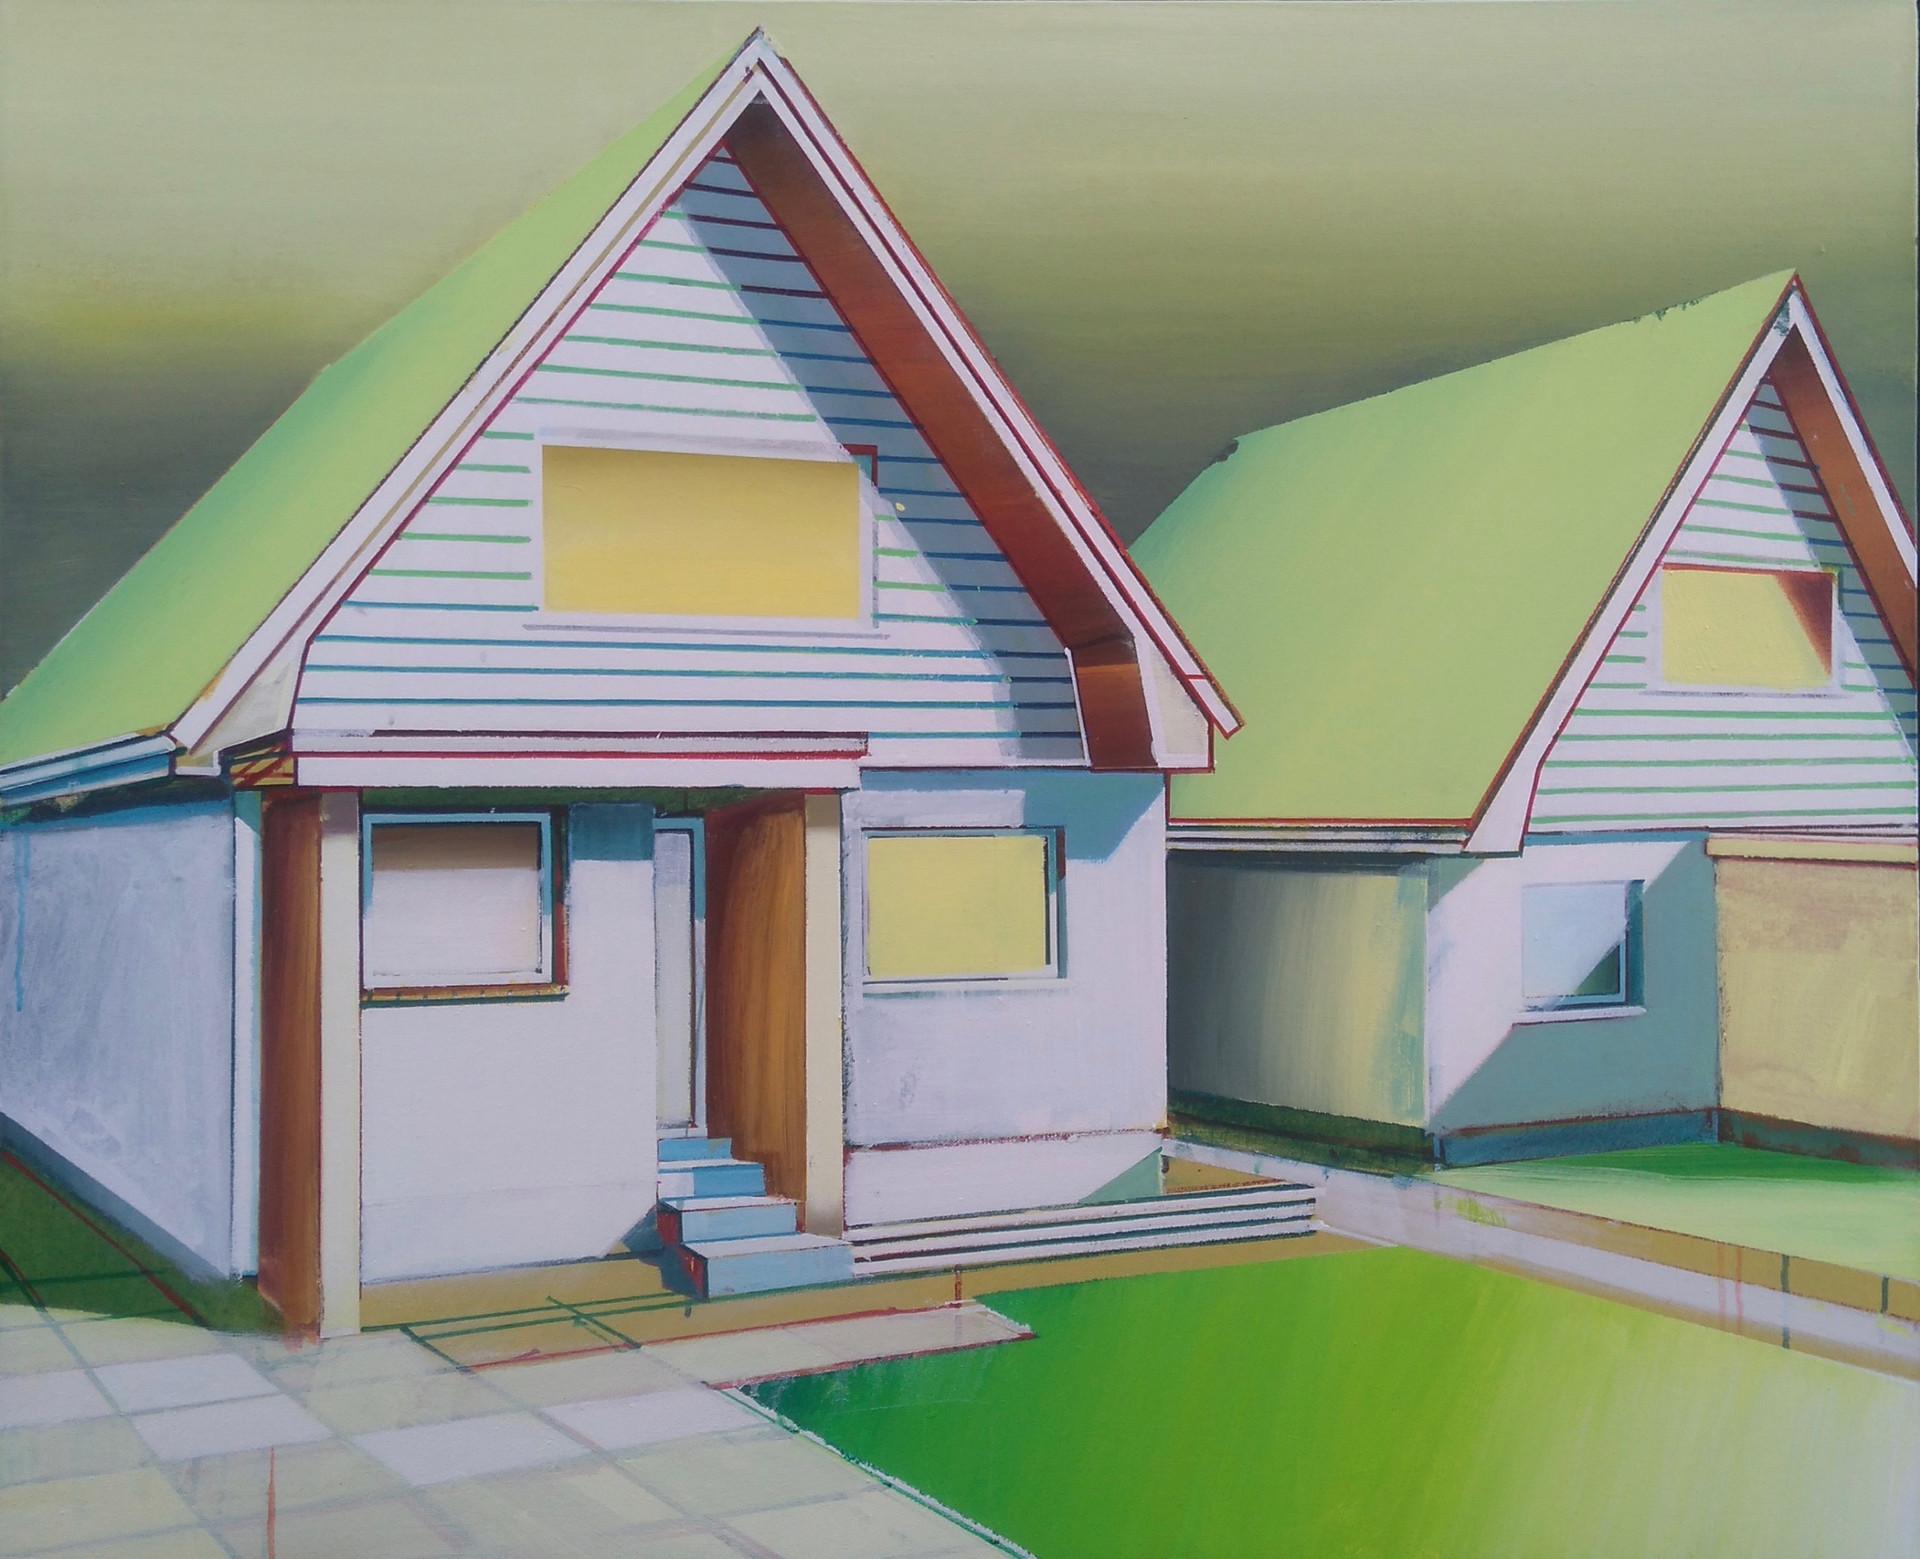 Triangle Houses 100x80cm